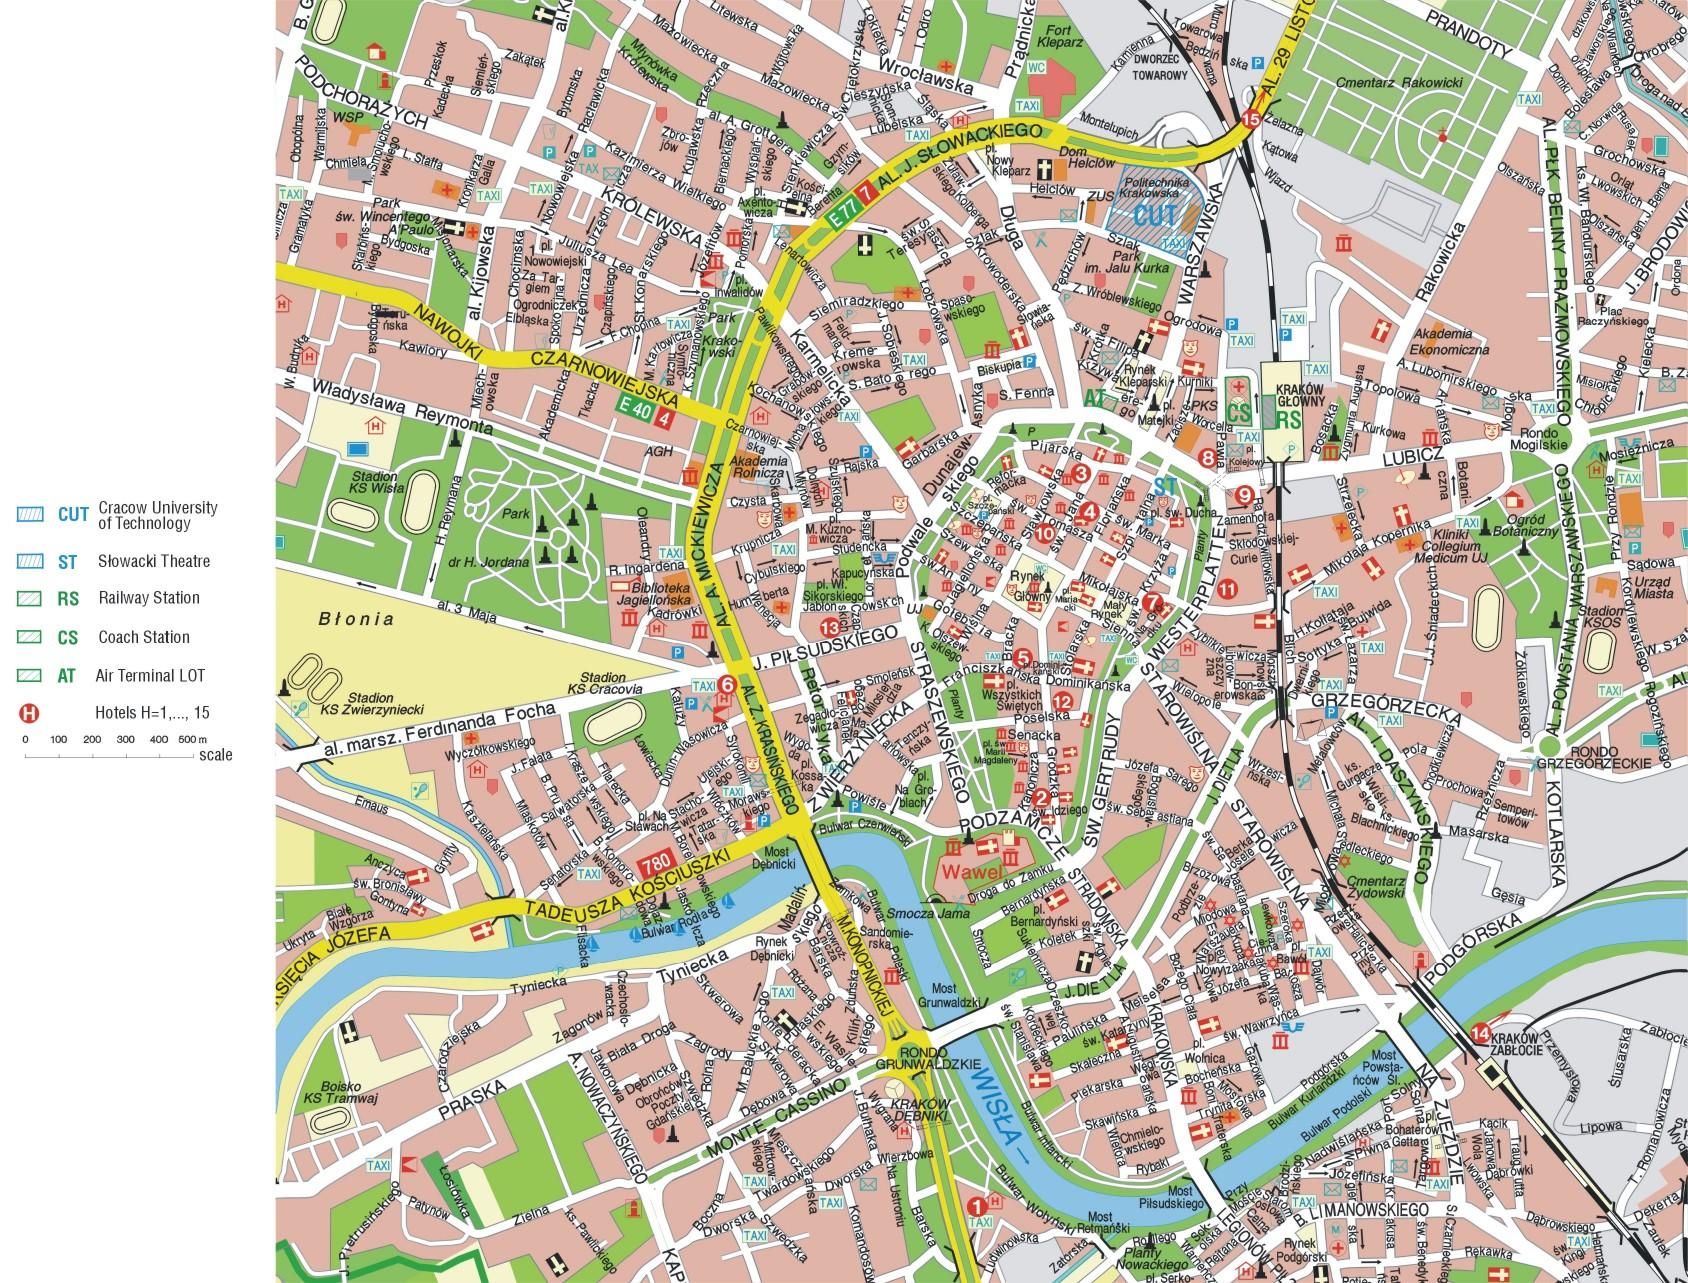 mapa2jpg – Map of London City Centre